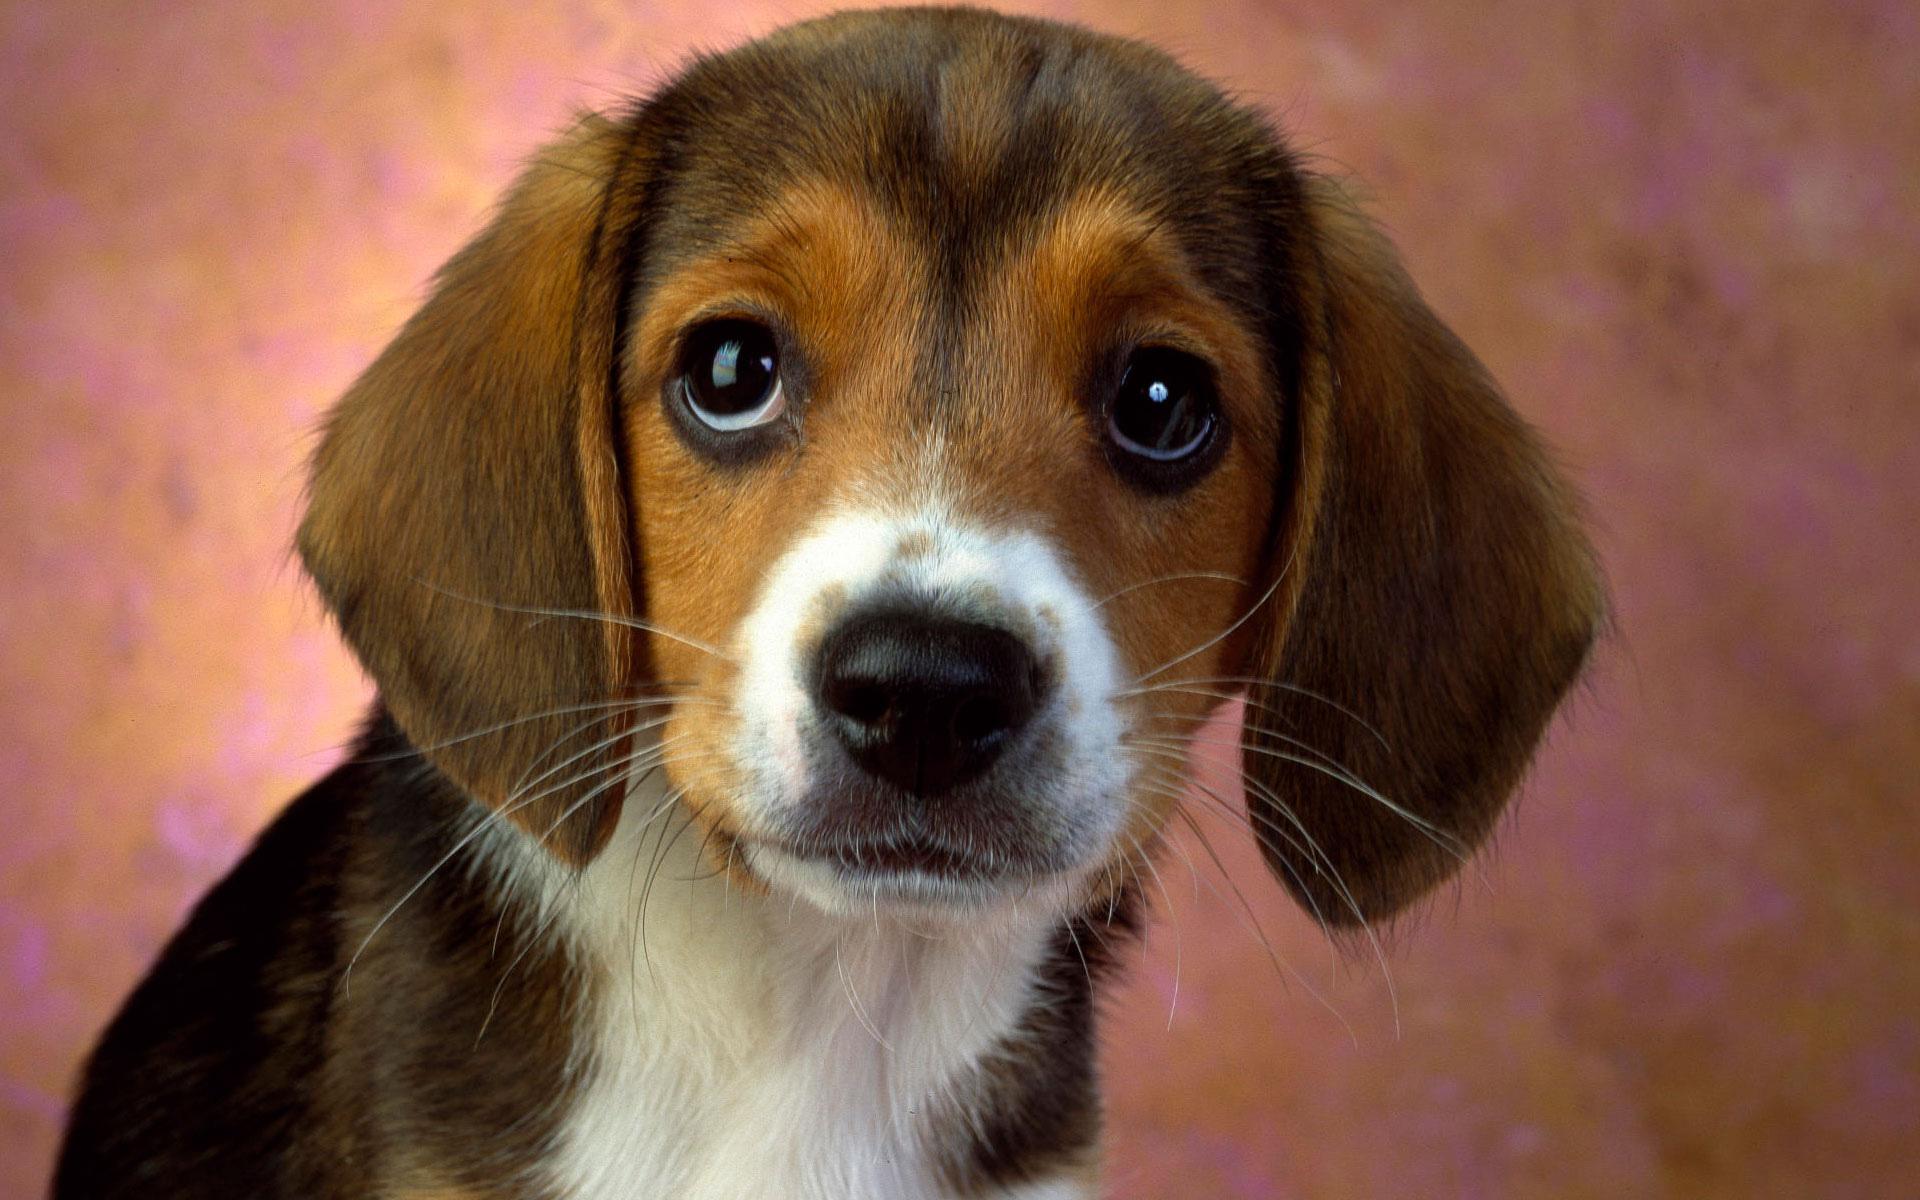 puppy_eyes_1920x1200